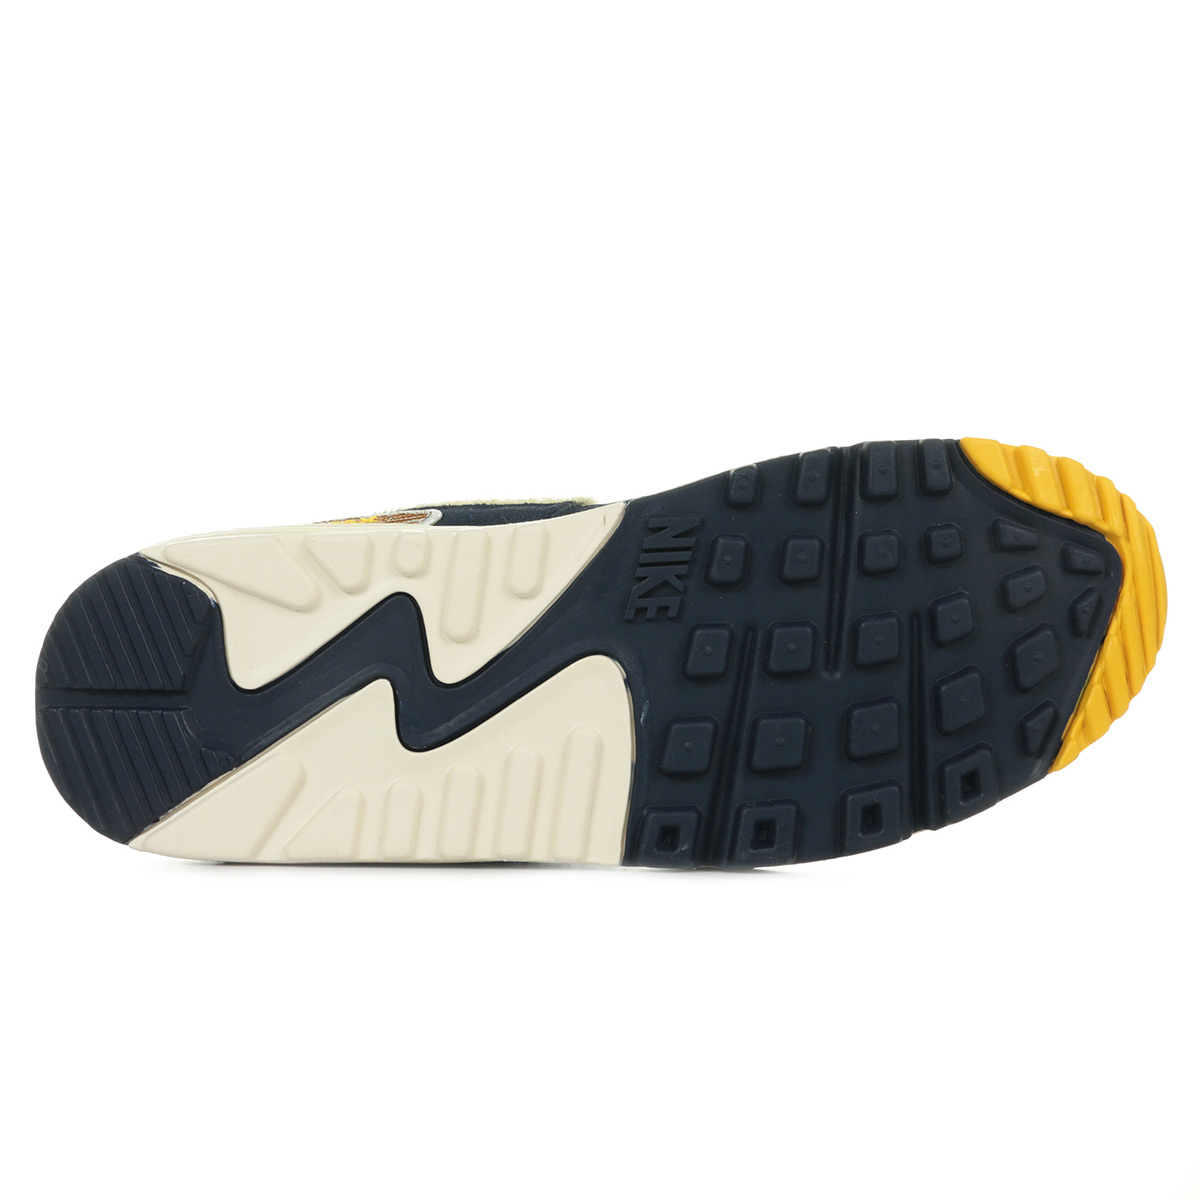 new arrivals f805c 2a5c5 Nike Air Max 90 Premium se Royal Bleu Baskets Homme - 858954-400